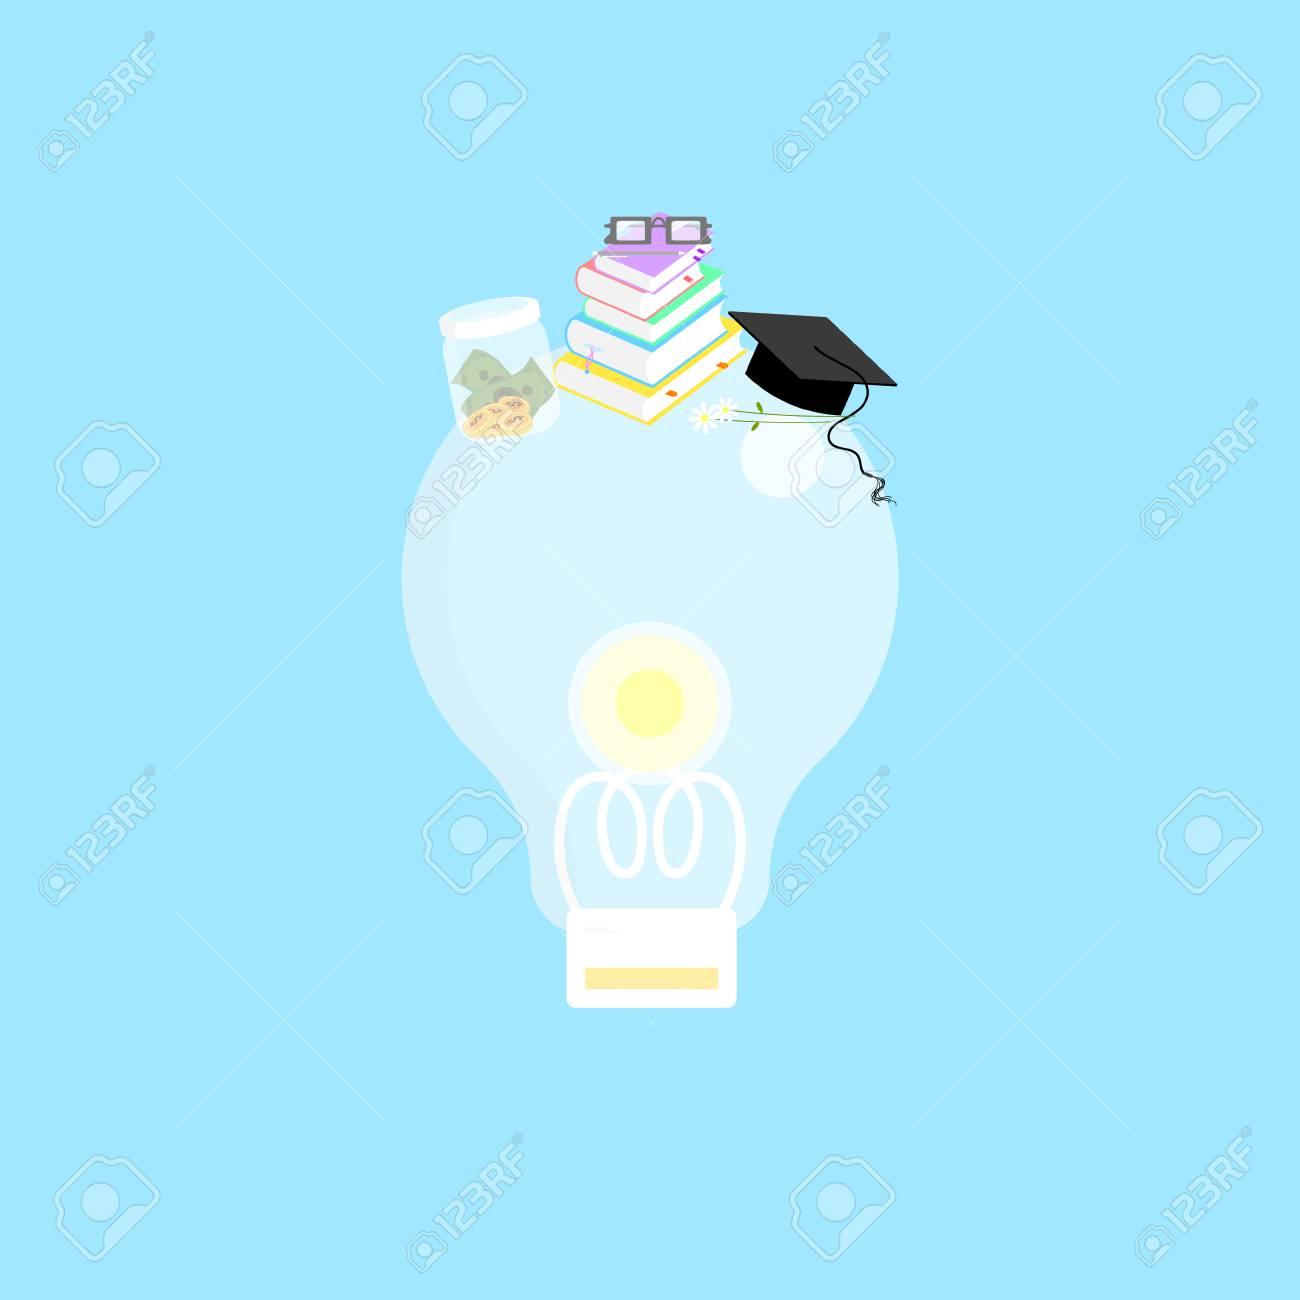 The Self Development Improve Creative Inspiration Idea Mind Brain Royalty Free Cliparts Vectors And Stock Illustration Image 110430145